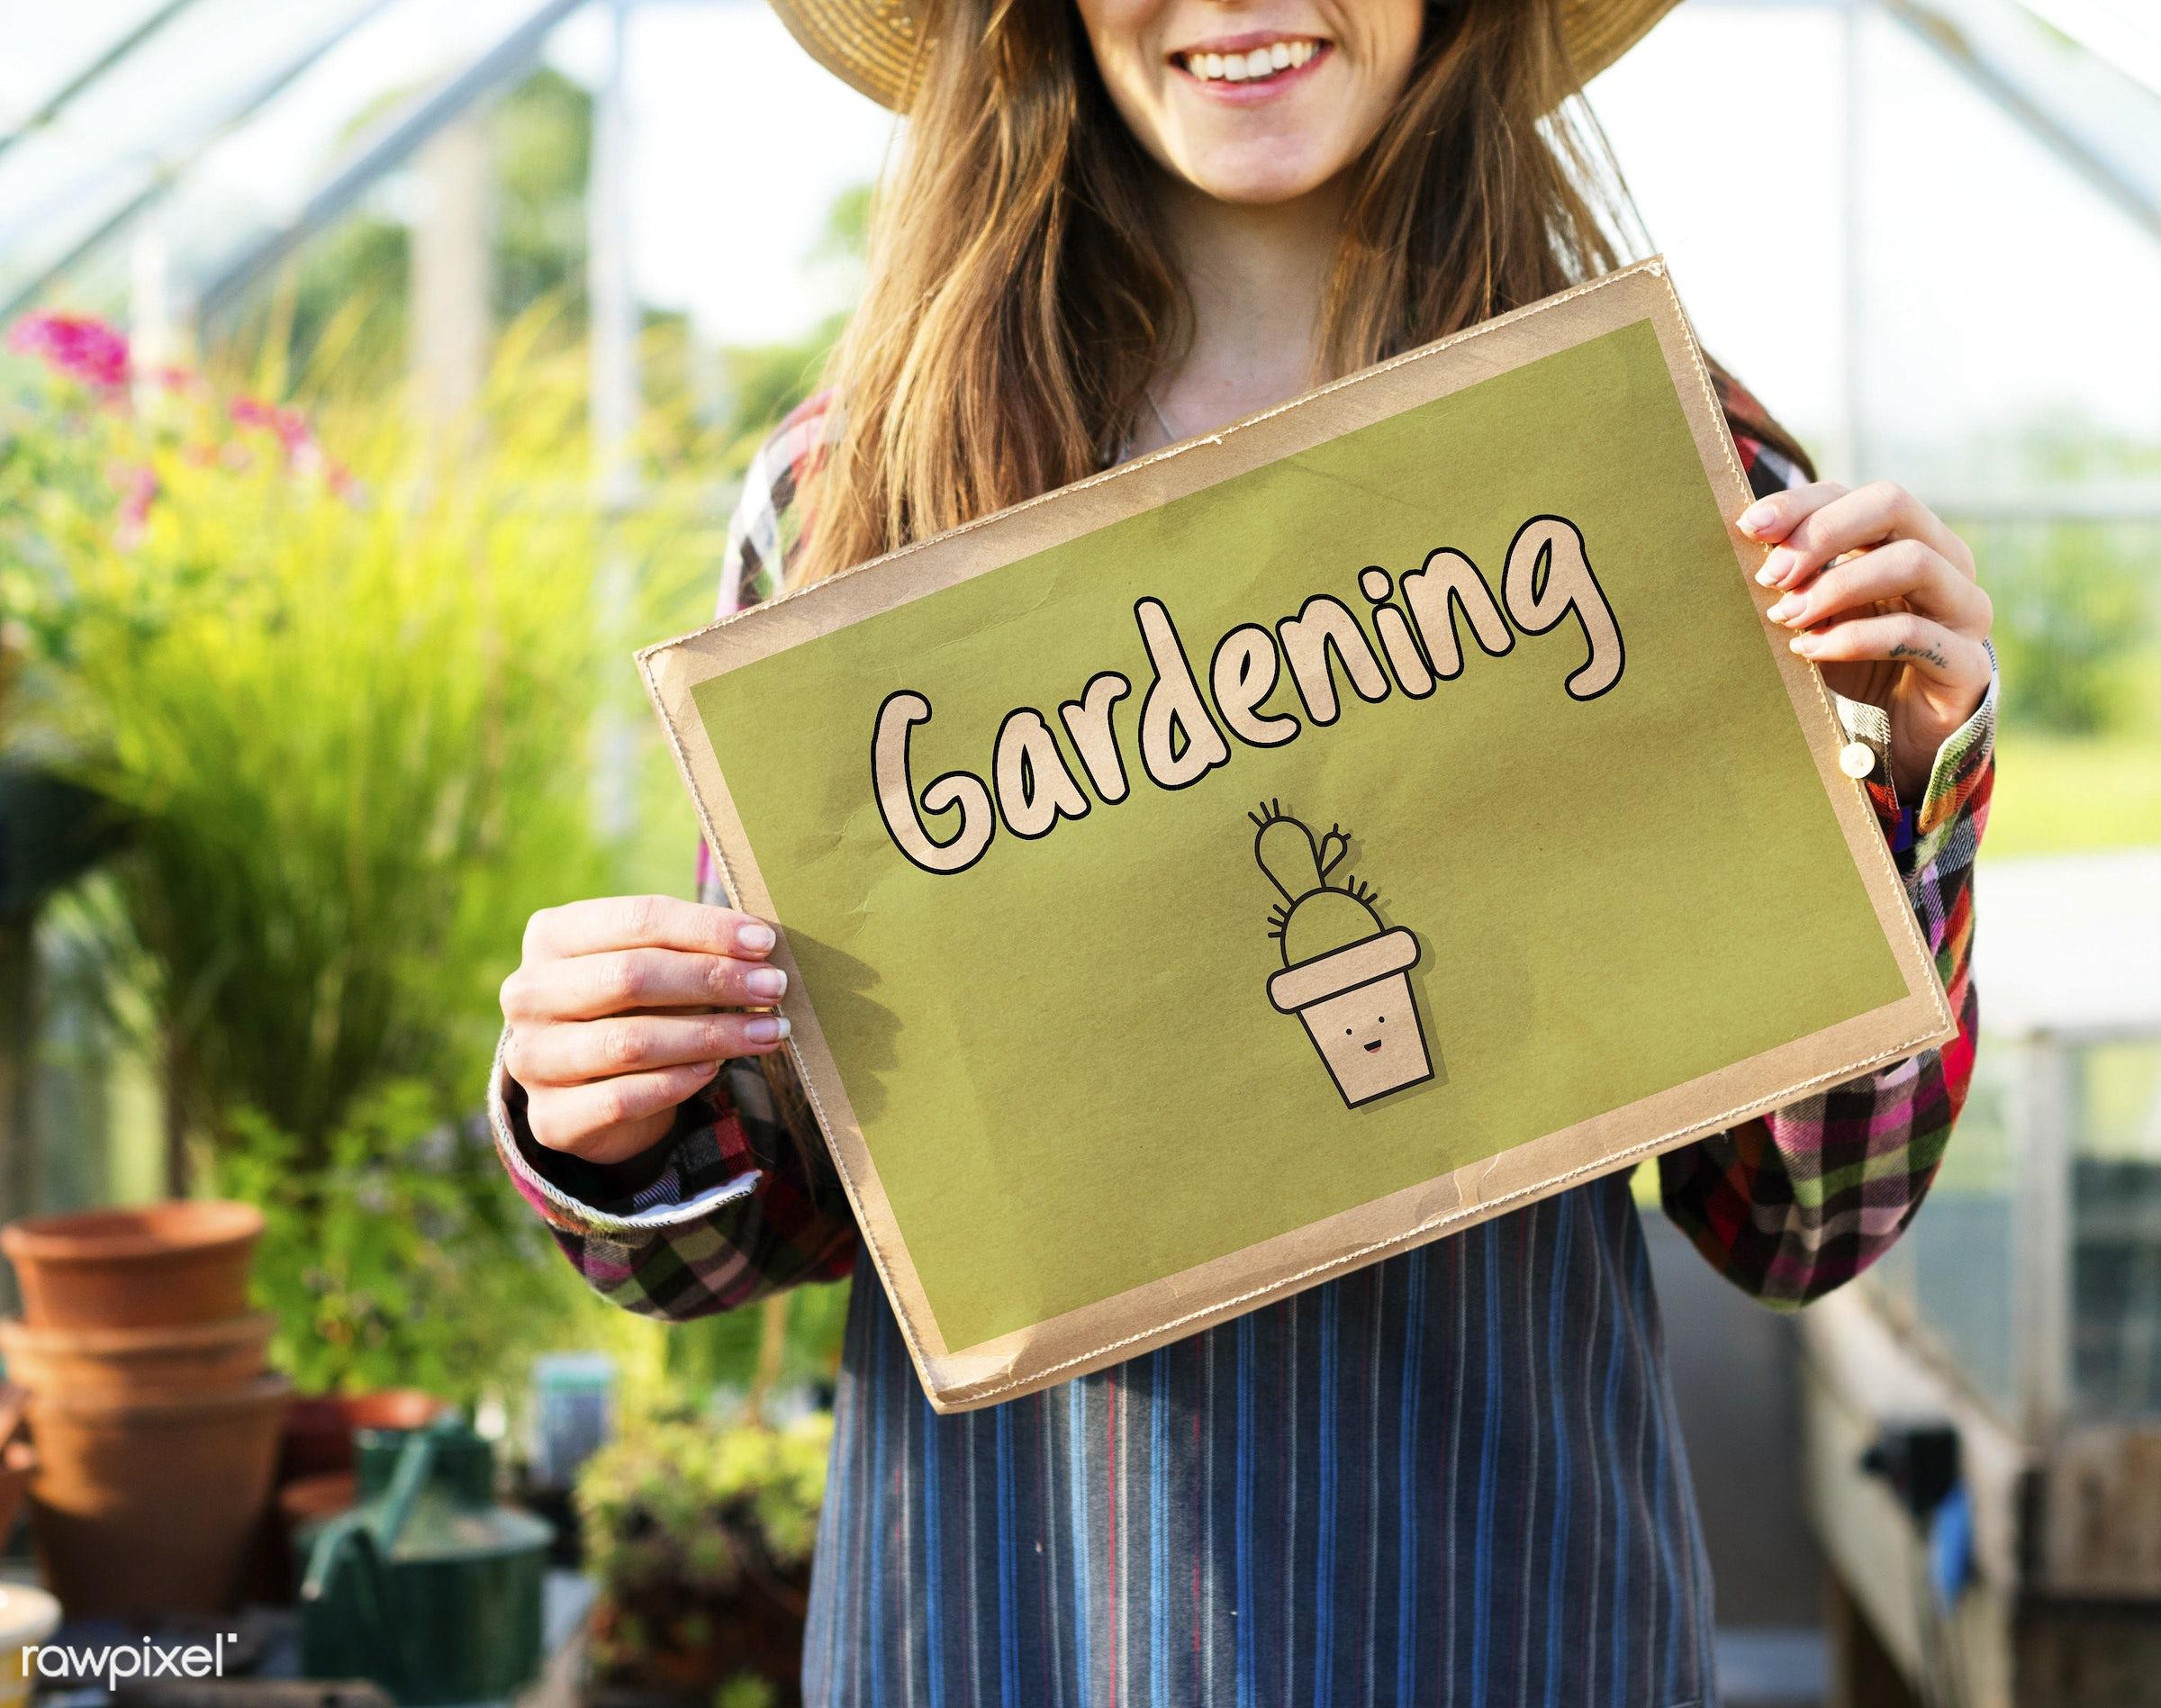 adult, botanical, caucasian, countryside, cultivate, dark blonde, delicious, design, environmental, farm, female, flowers,...